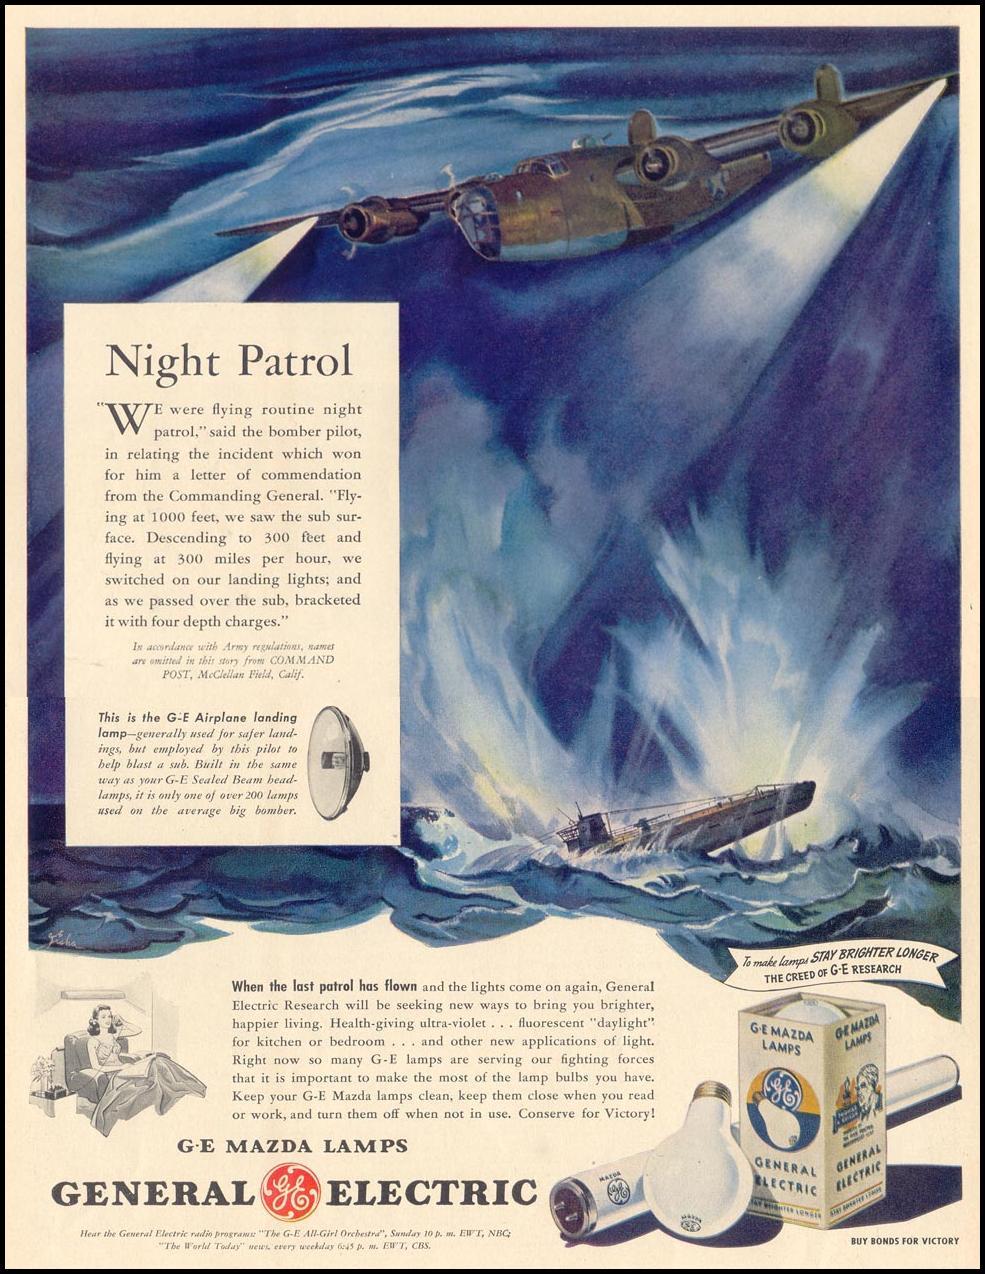 G. E. MAZDA LAMPS LIFE 02/21/1944